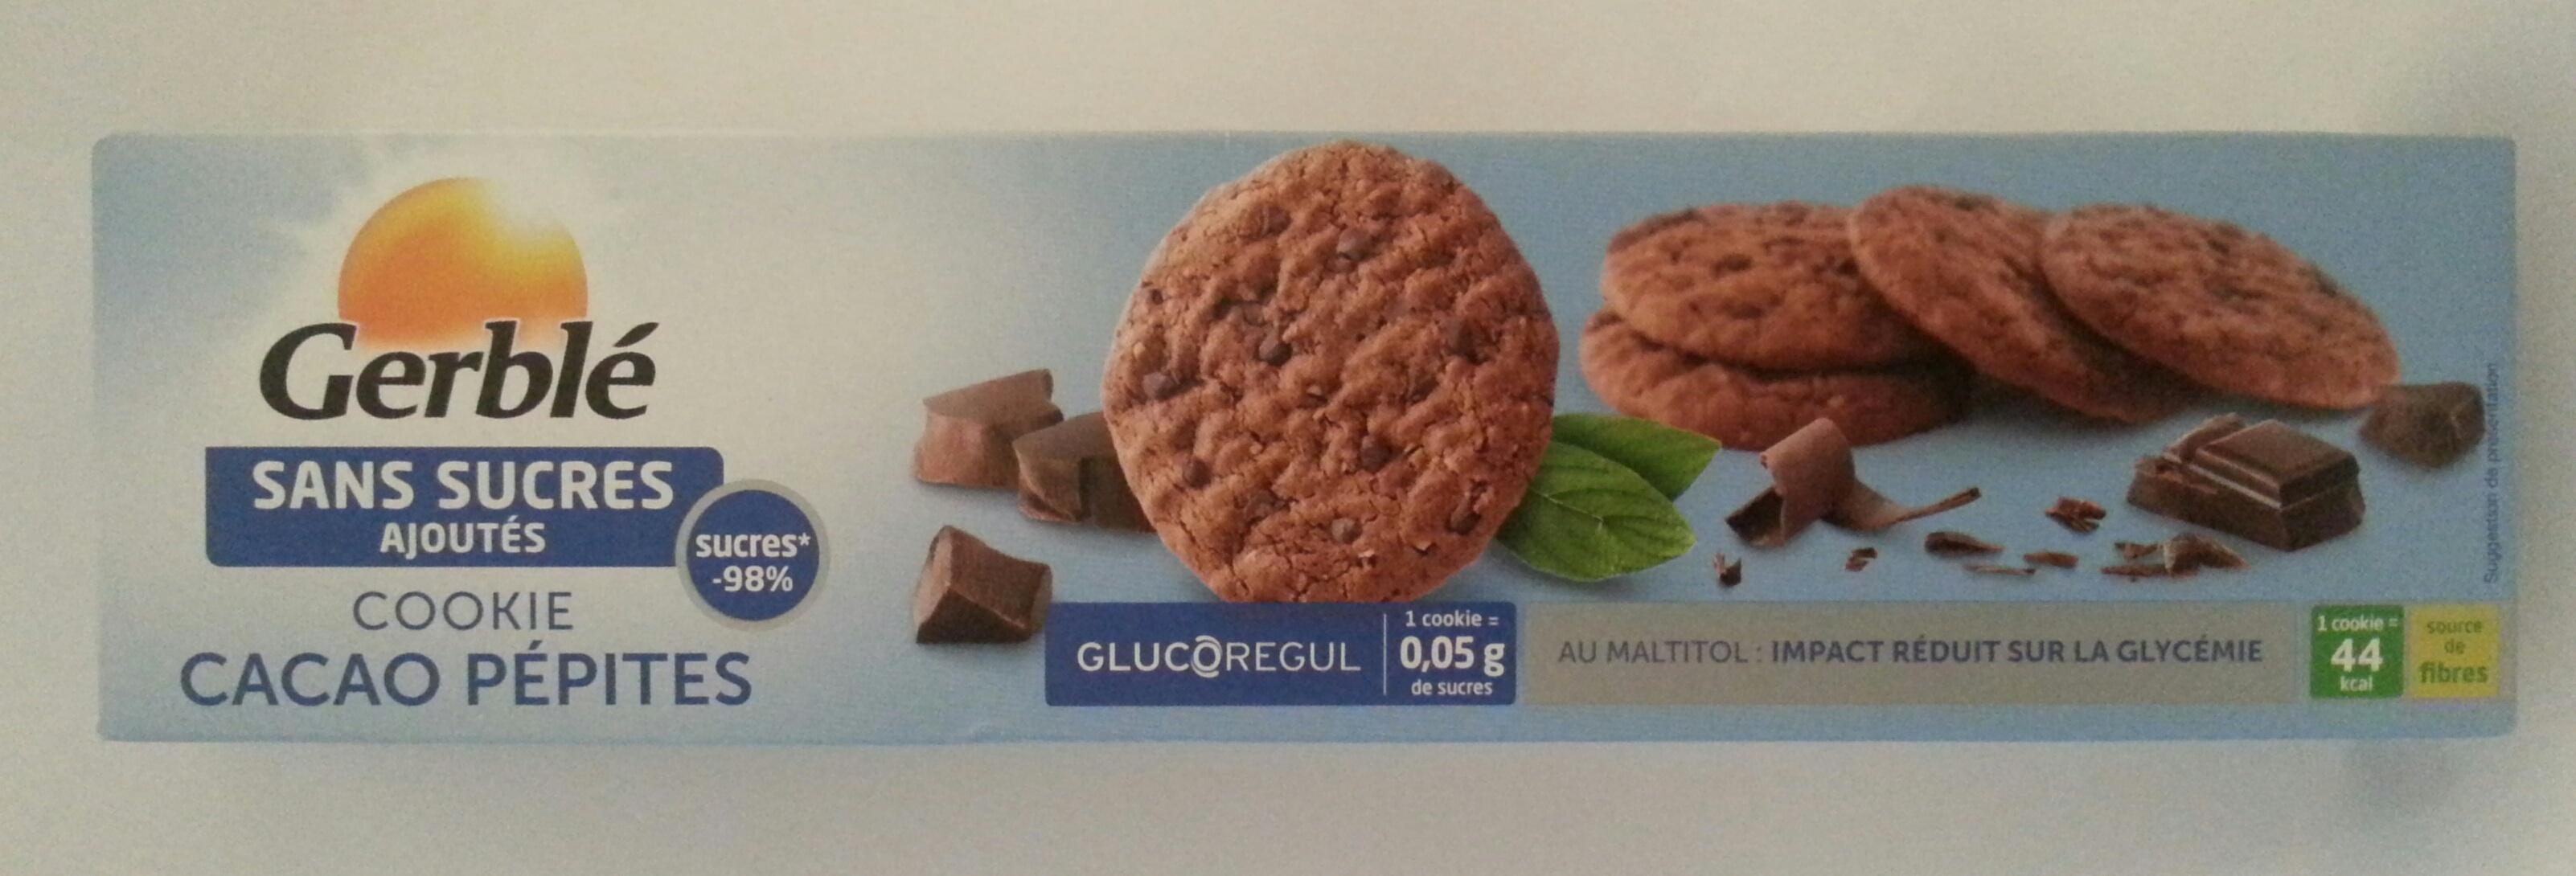 Cookie cacao pépites - Product - fr